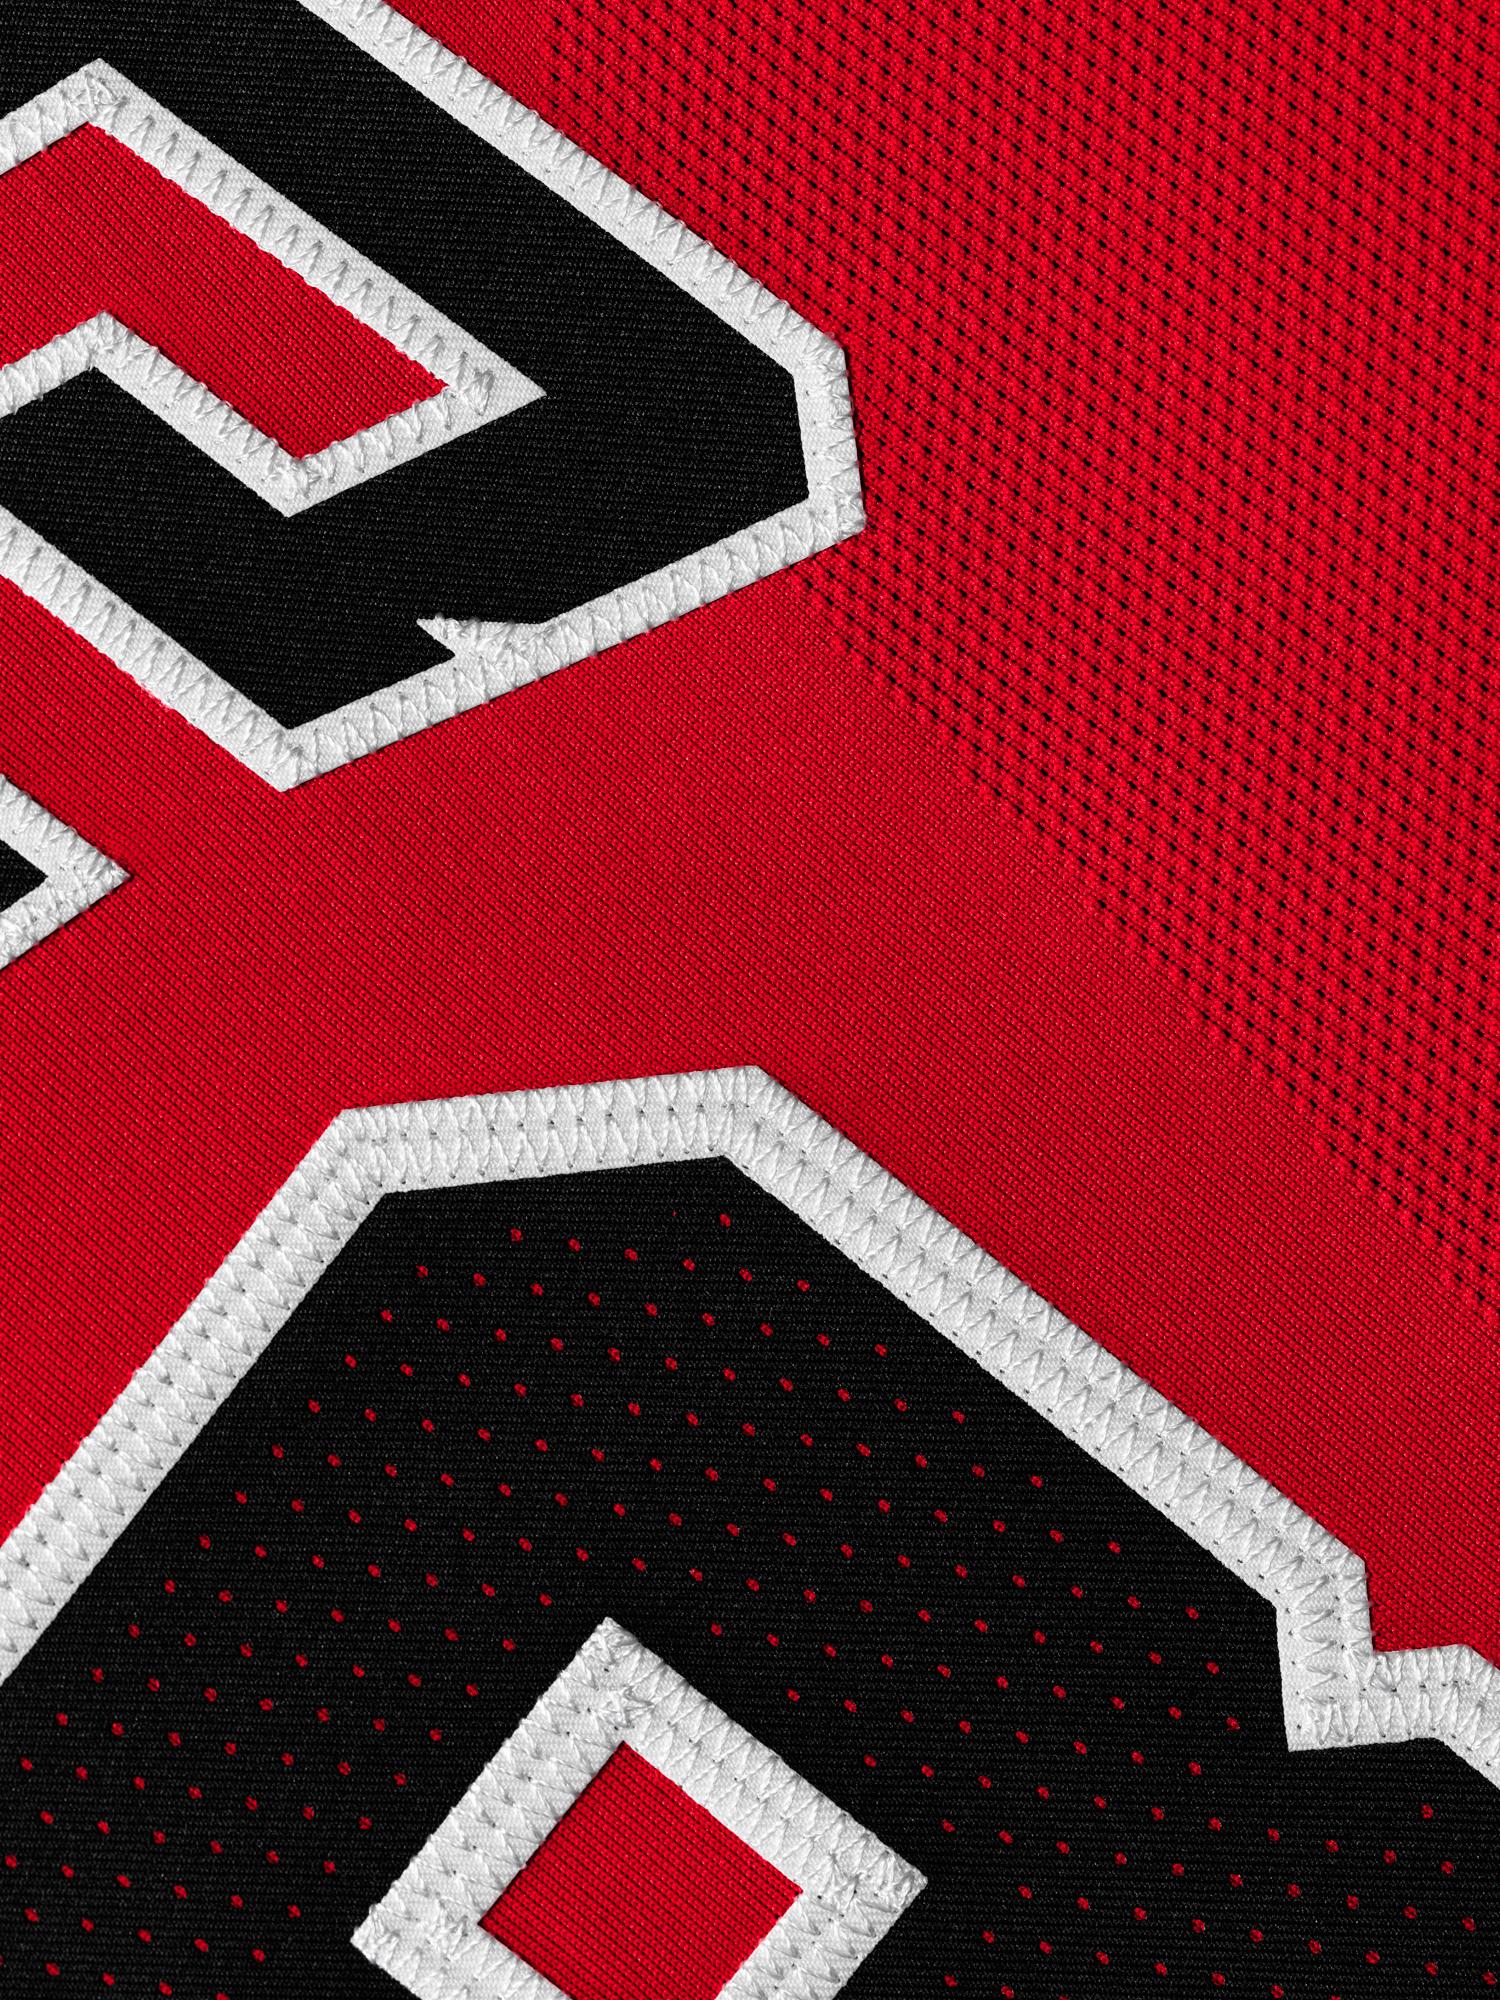 save off e8a6e 73db8 Jordan 14 Last Shot Michael Jordan Bulls Jersey ...